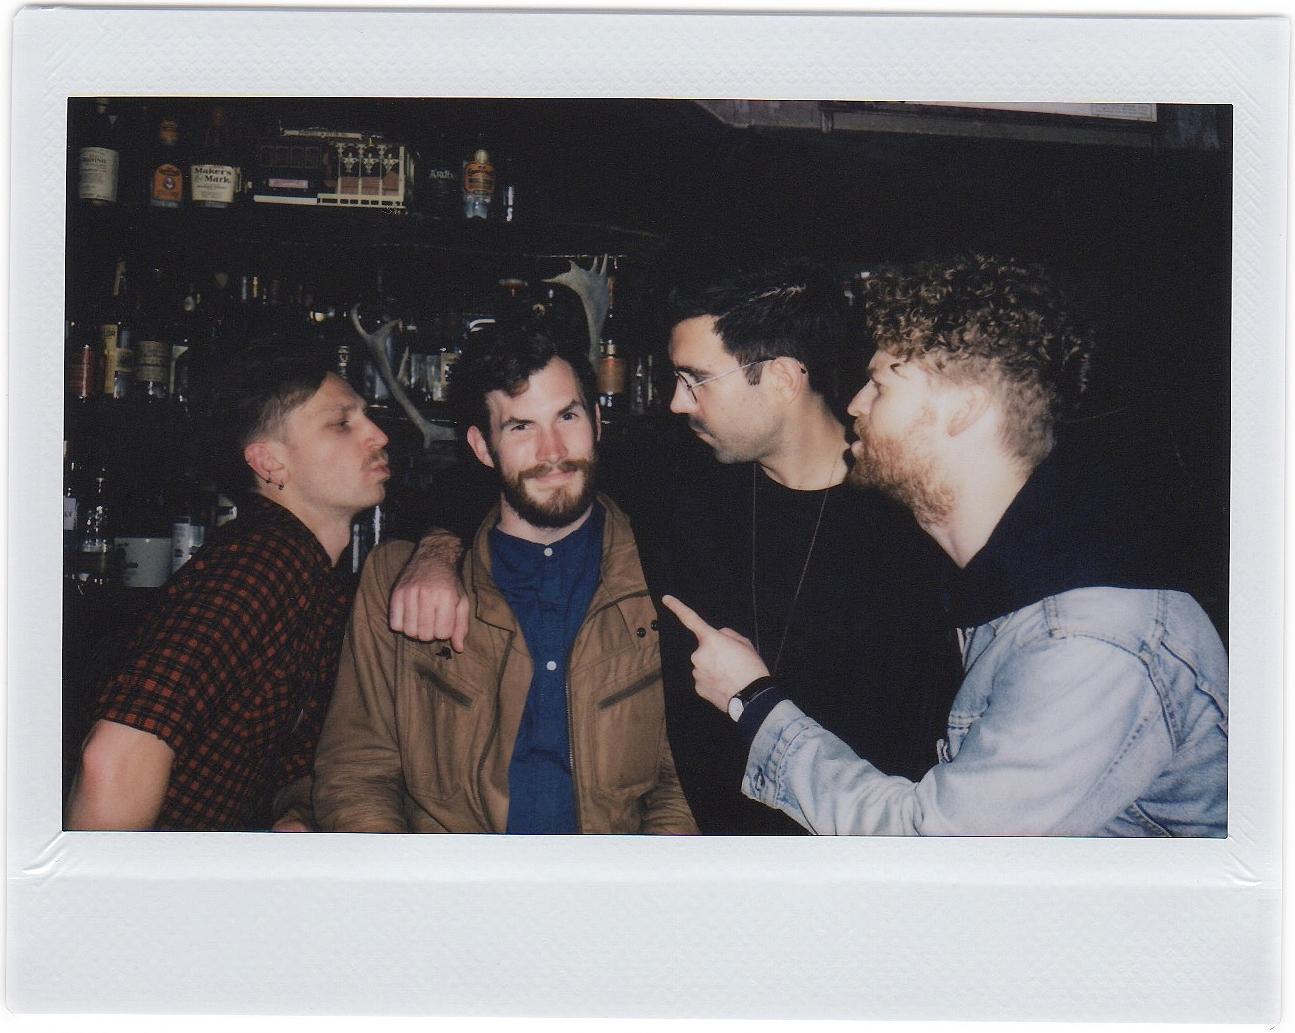 The Nick Murphy crew